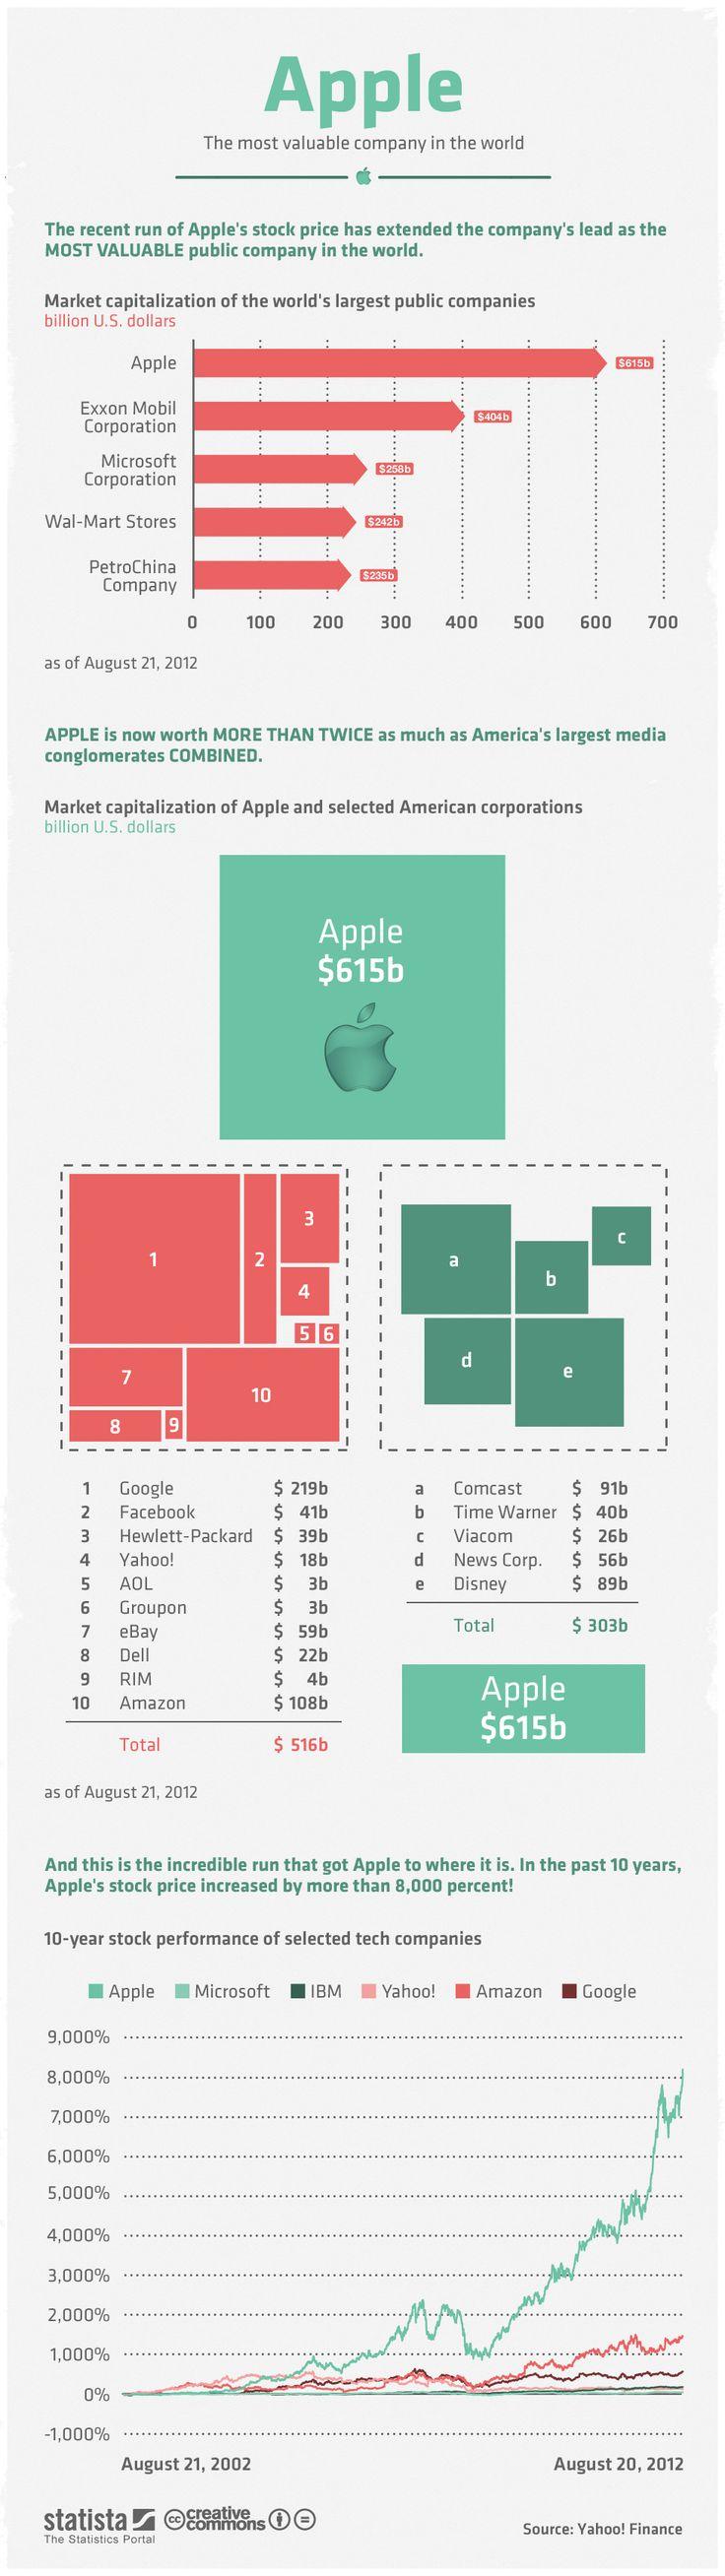 Apple's value